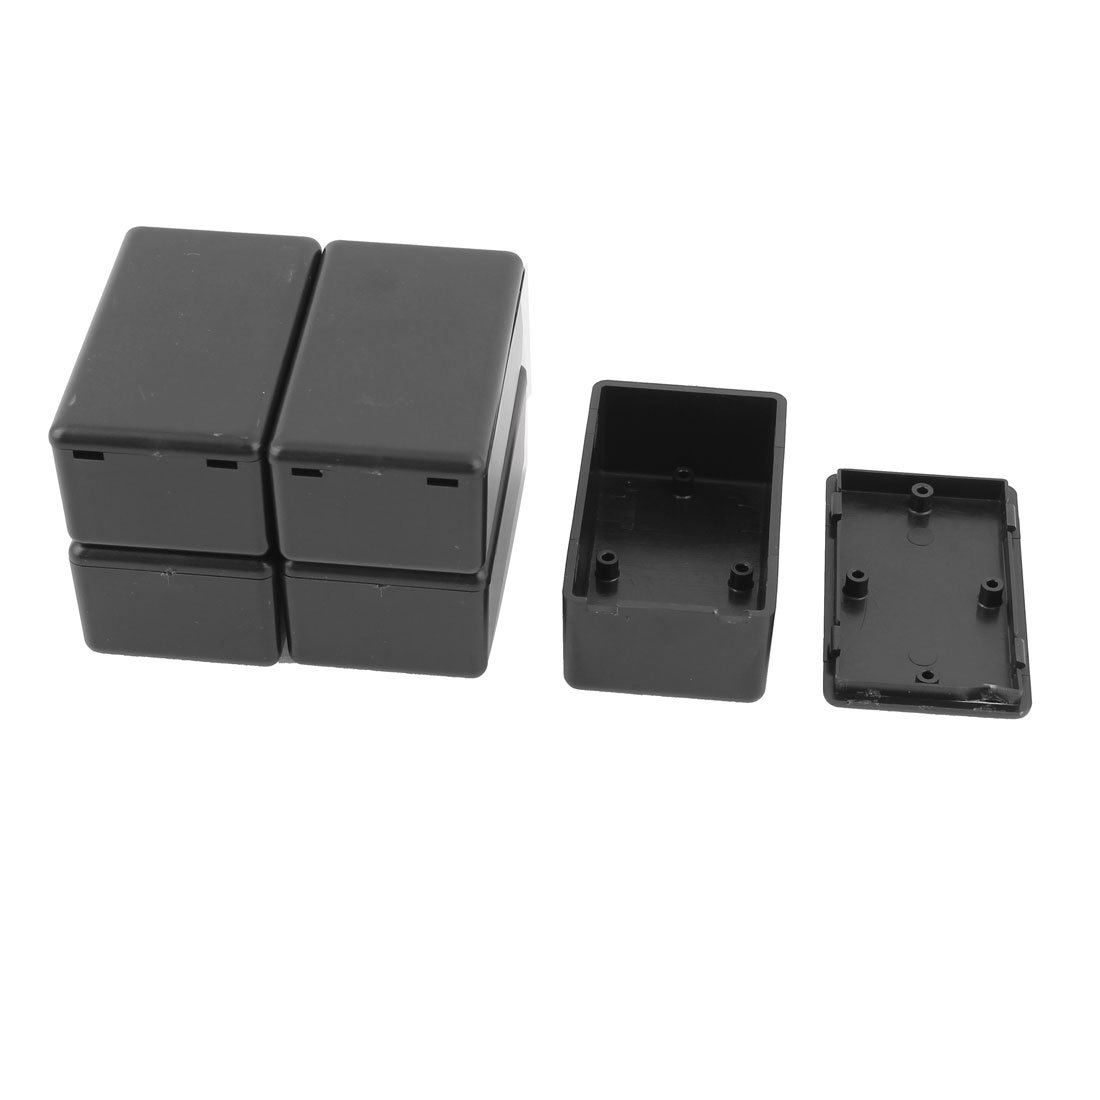 Amazon.com: uxcell 5pcs Plastic Electric Project Case Junction Box ...